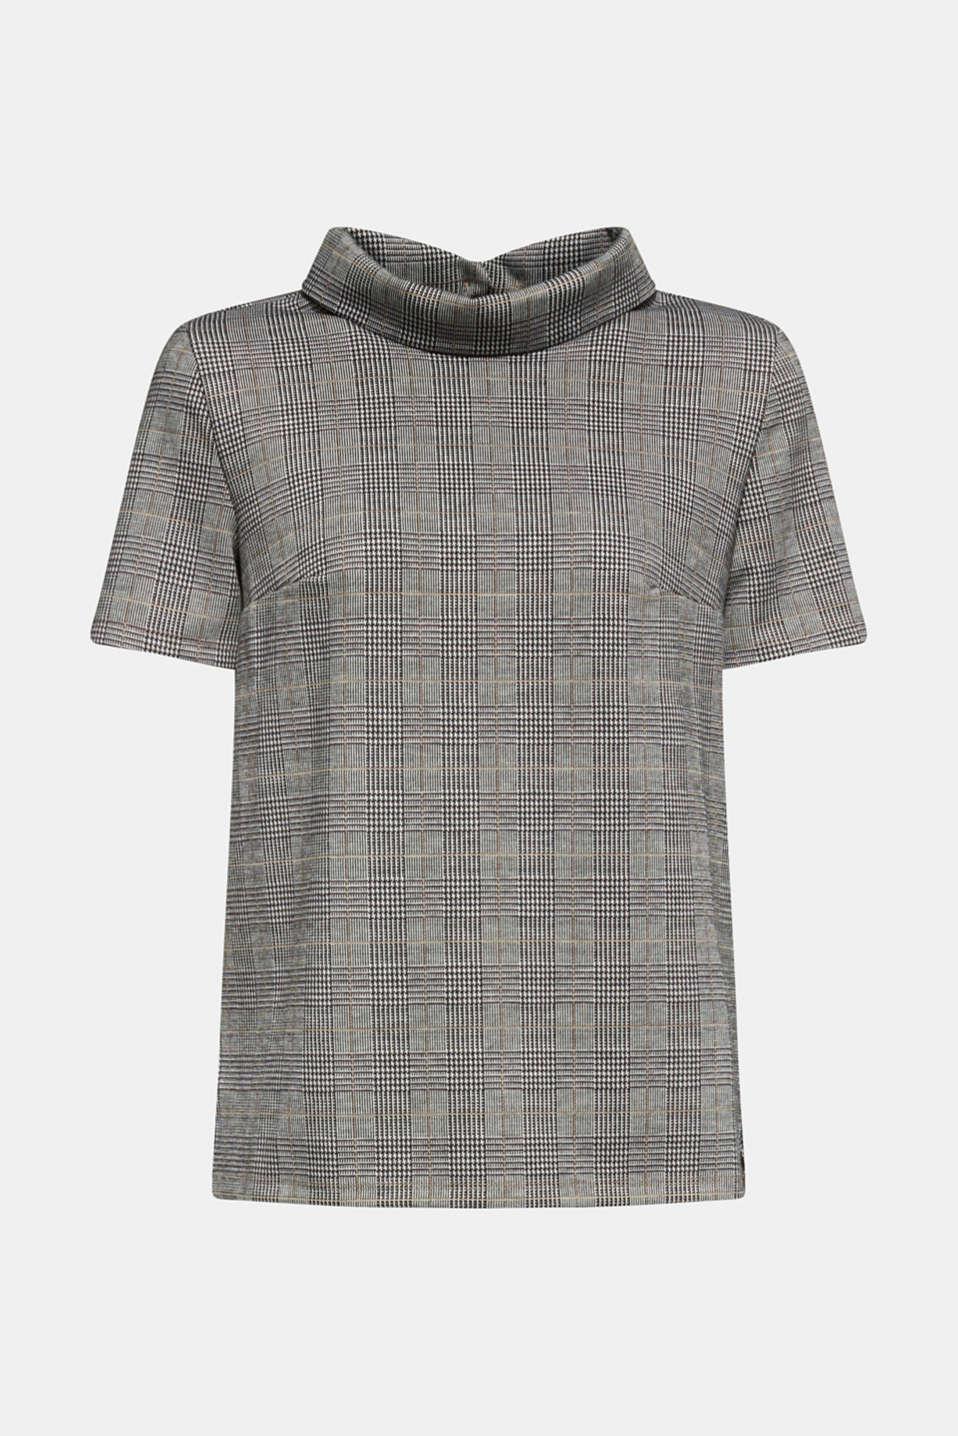 T-Shirts, CAMEL, detail image number 6